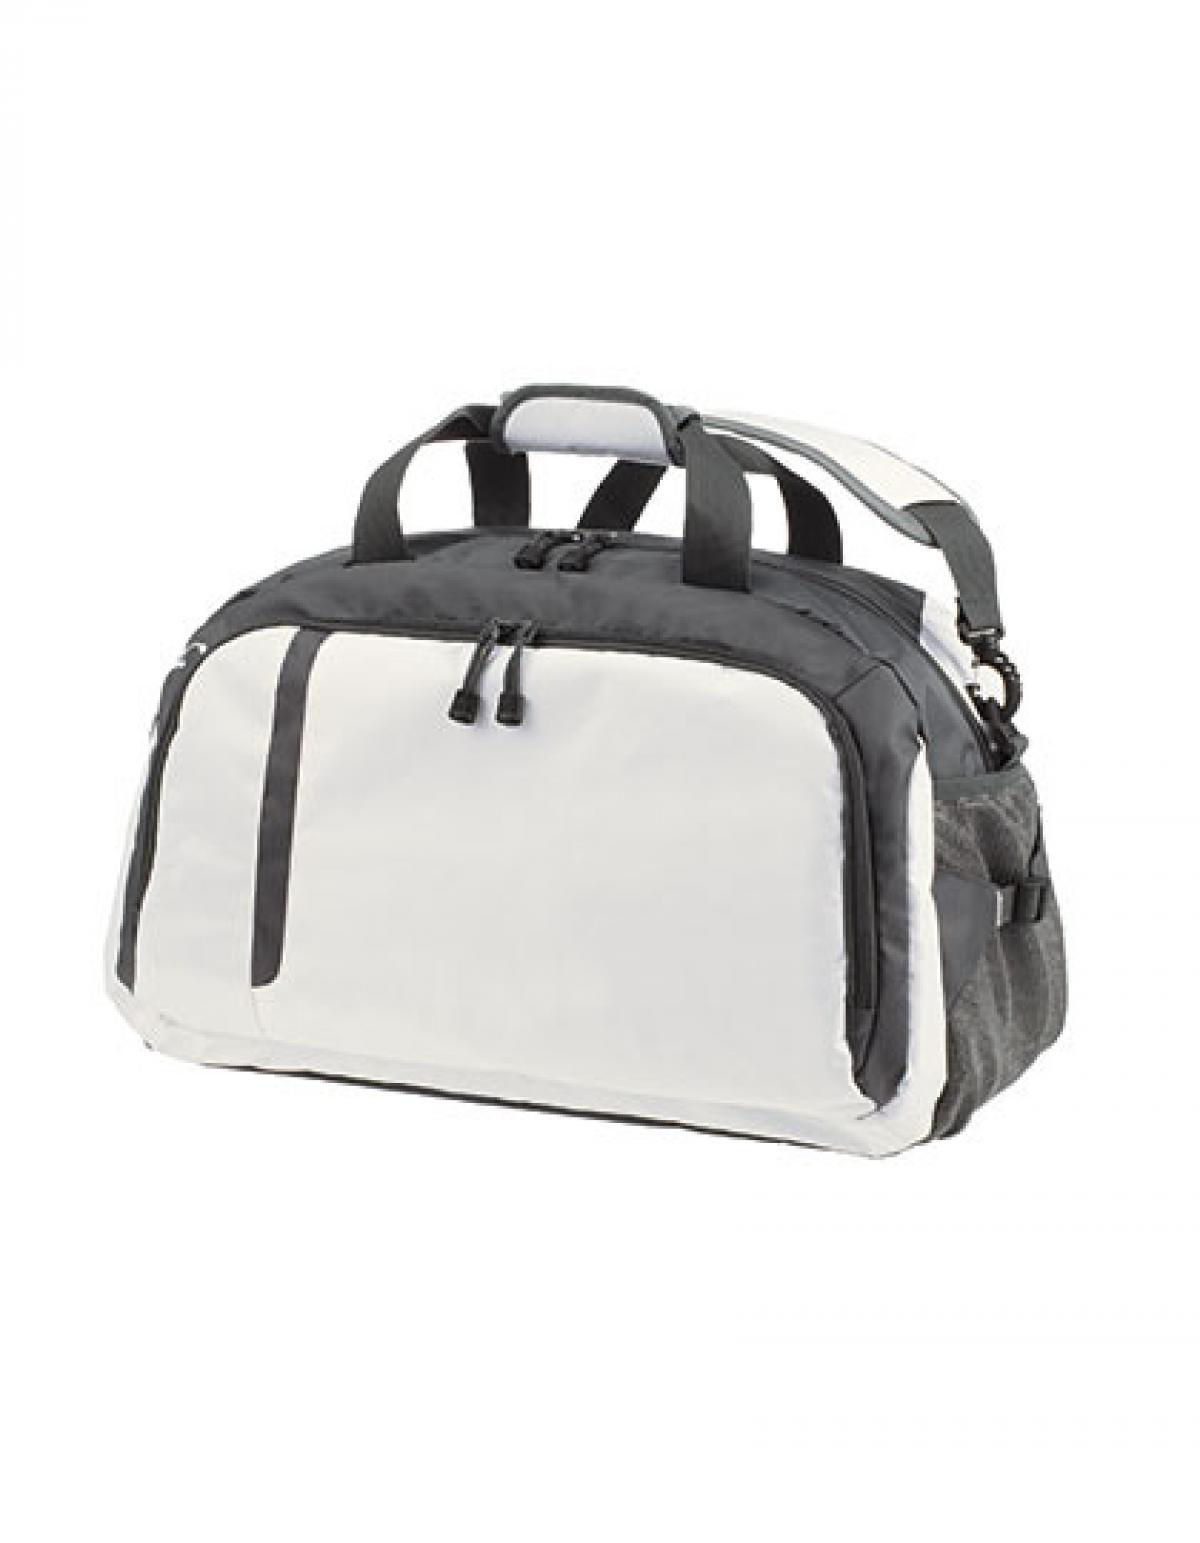 Harga Jual Travel Bag Termurah 2018 Cerruti Cra128sblr03bl Biru Ring Rosegold Plat Sport Galaxy 49 X 33 22 Cm Rexlanders